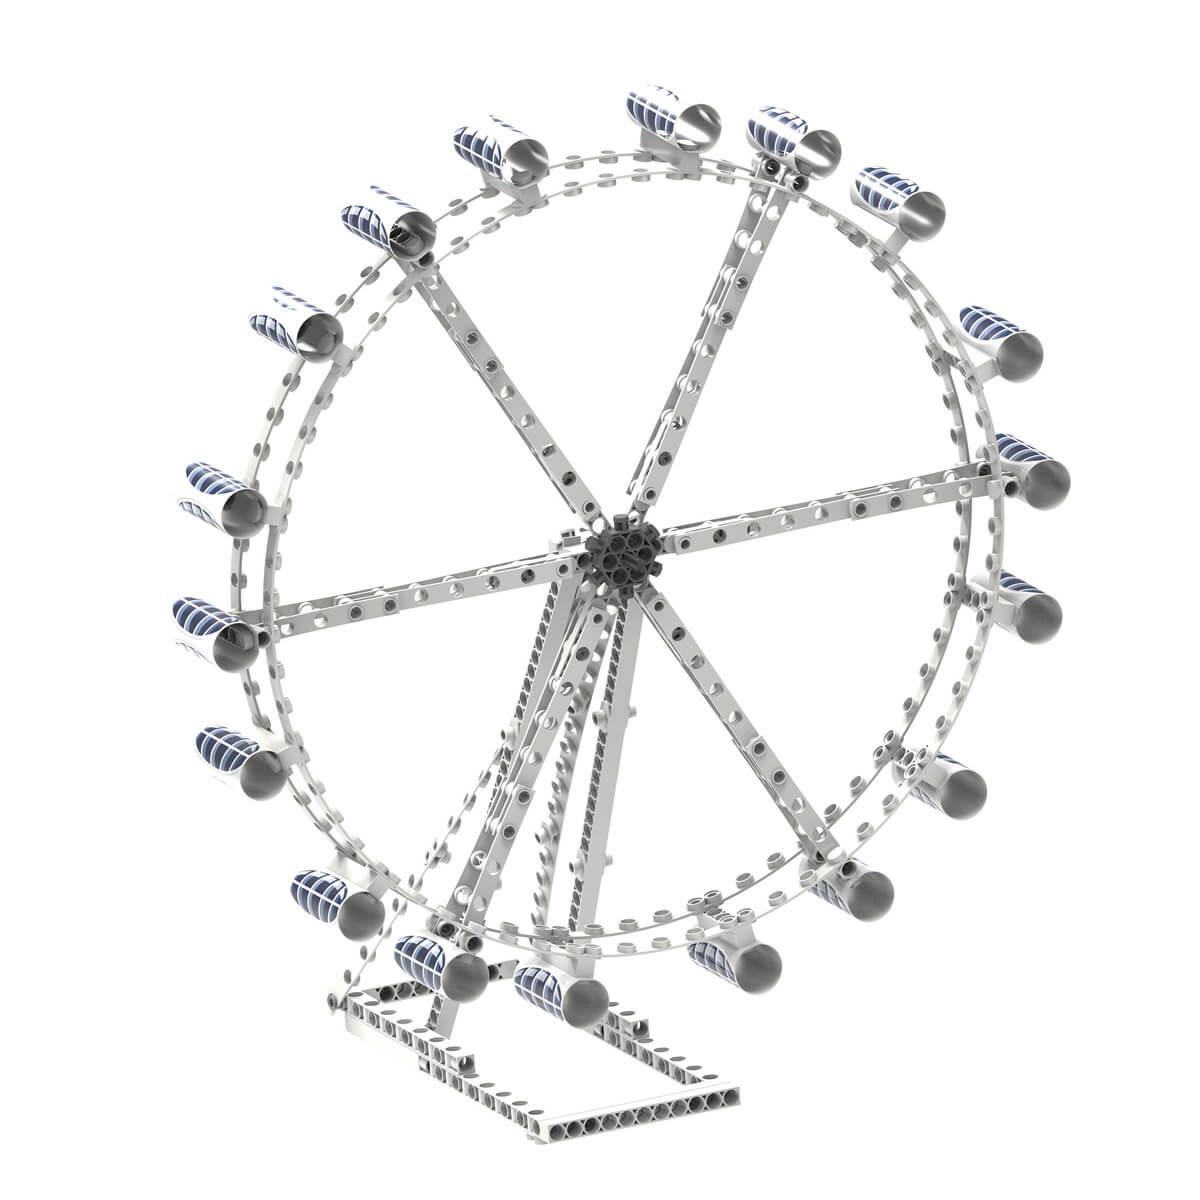 Build a ferris wheel